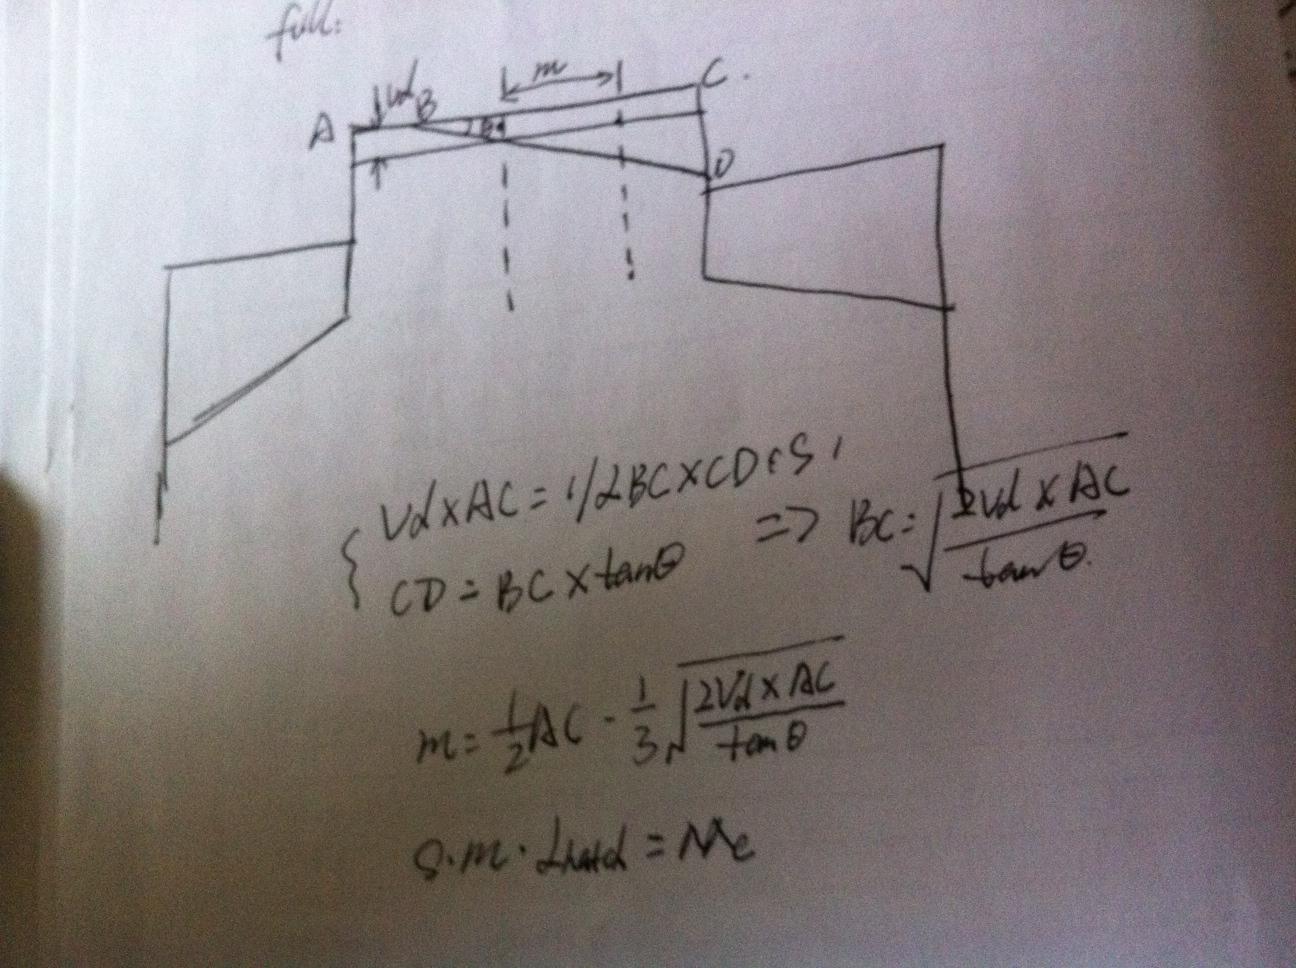 Grain heeling volumetric moment calculation boat design net fullg pooptronica Gallery